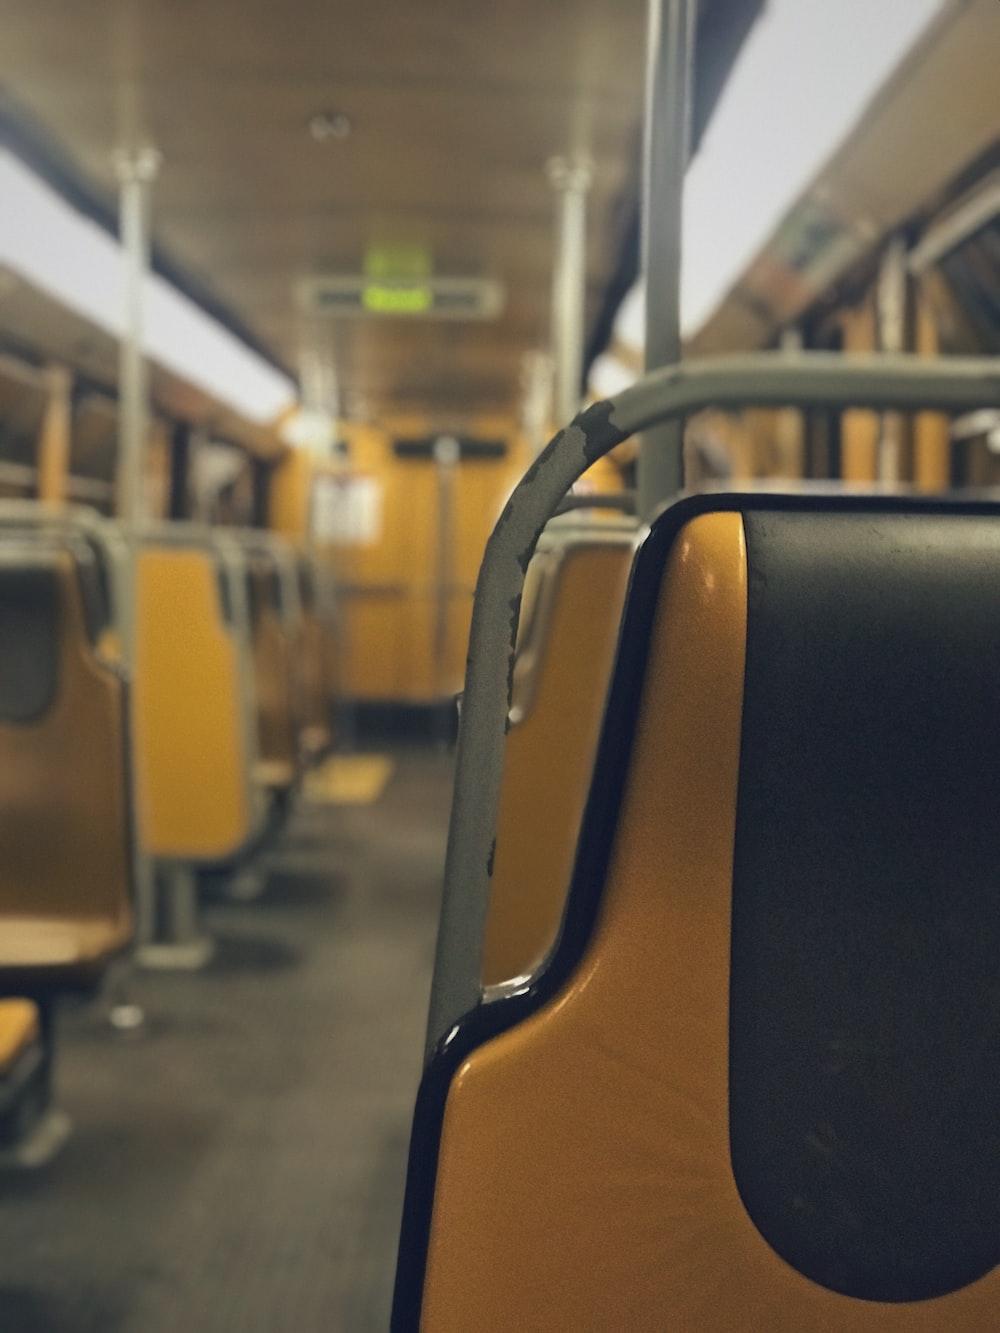 empty public passenger vehicle